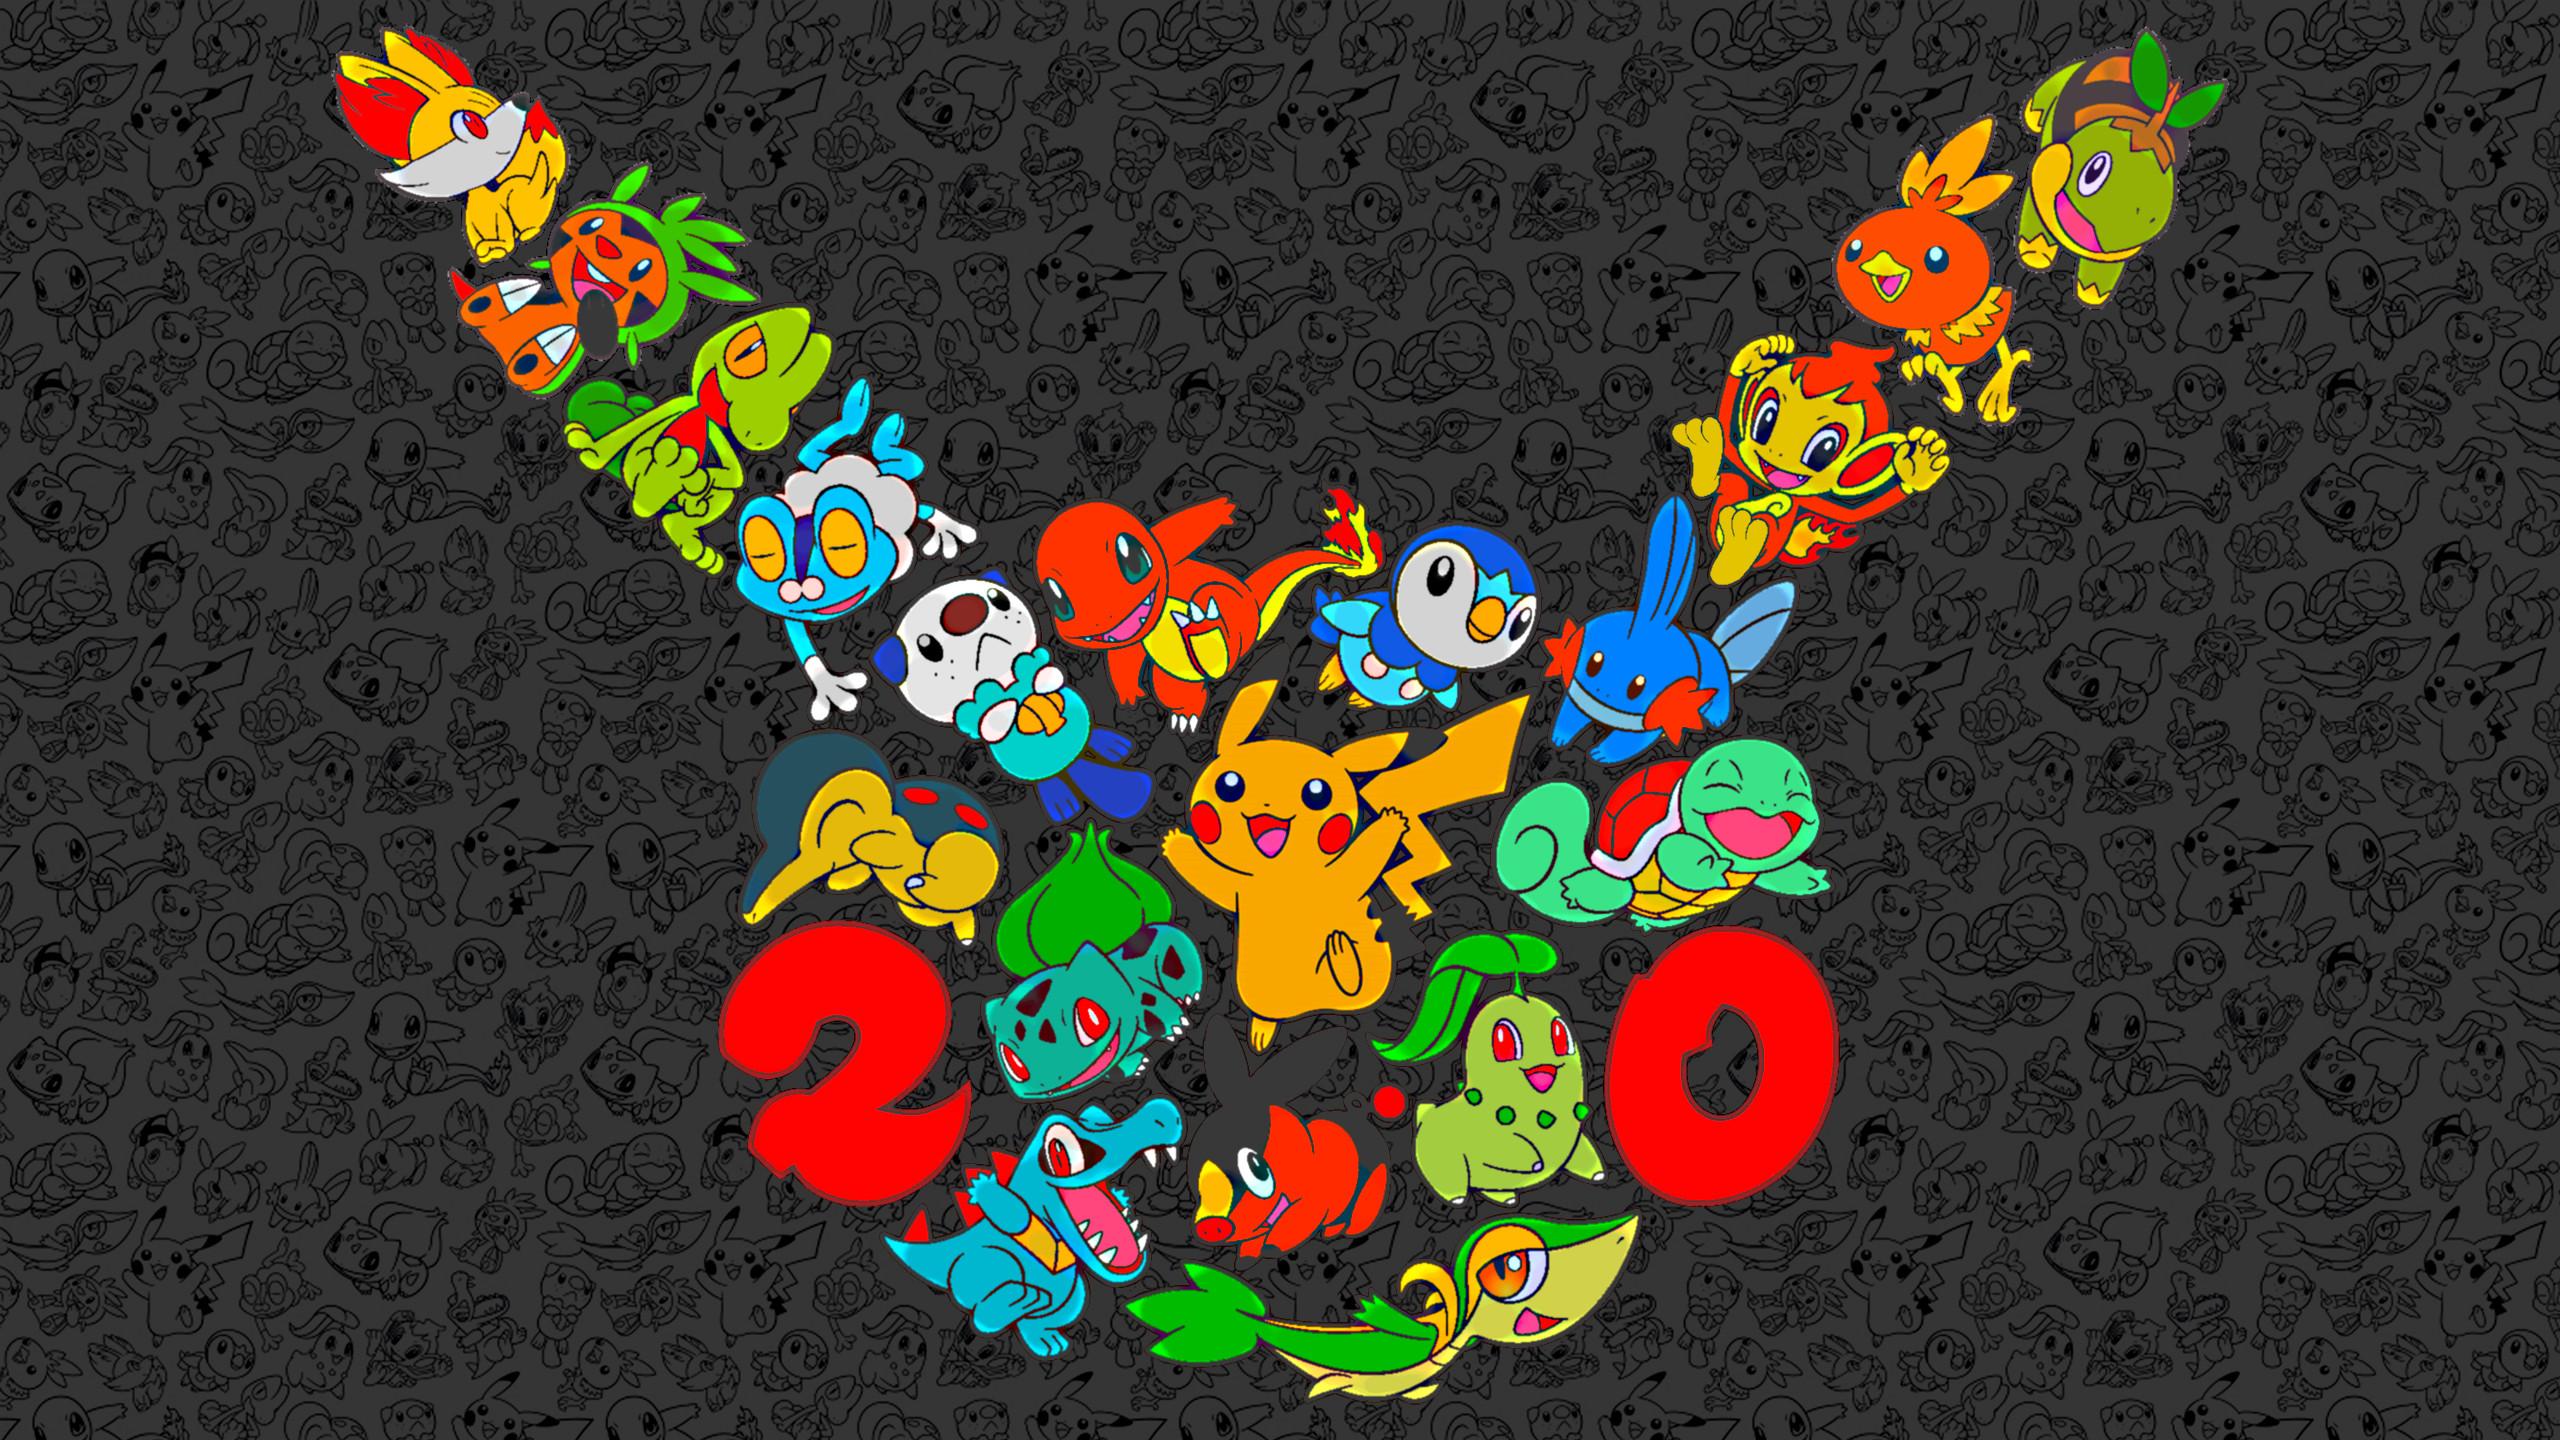 Pokemon 20th Anniversary Wallpapers